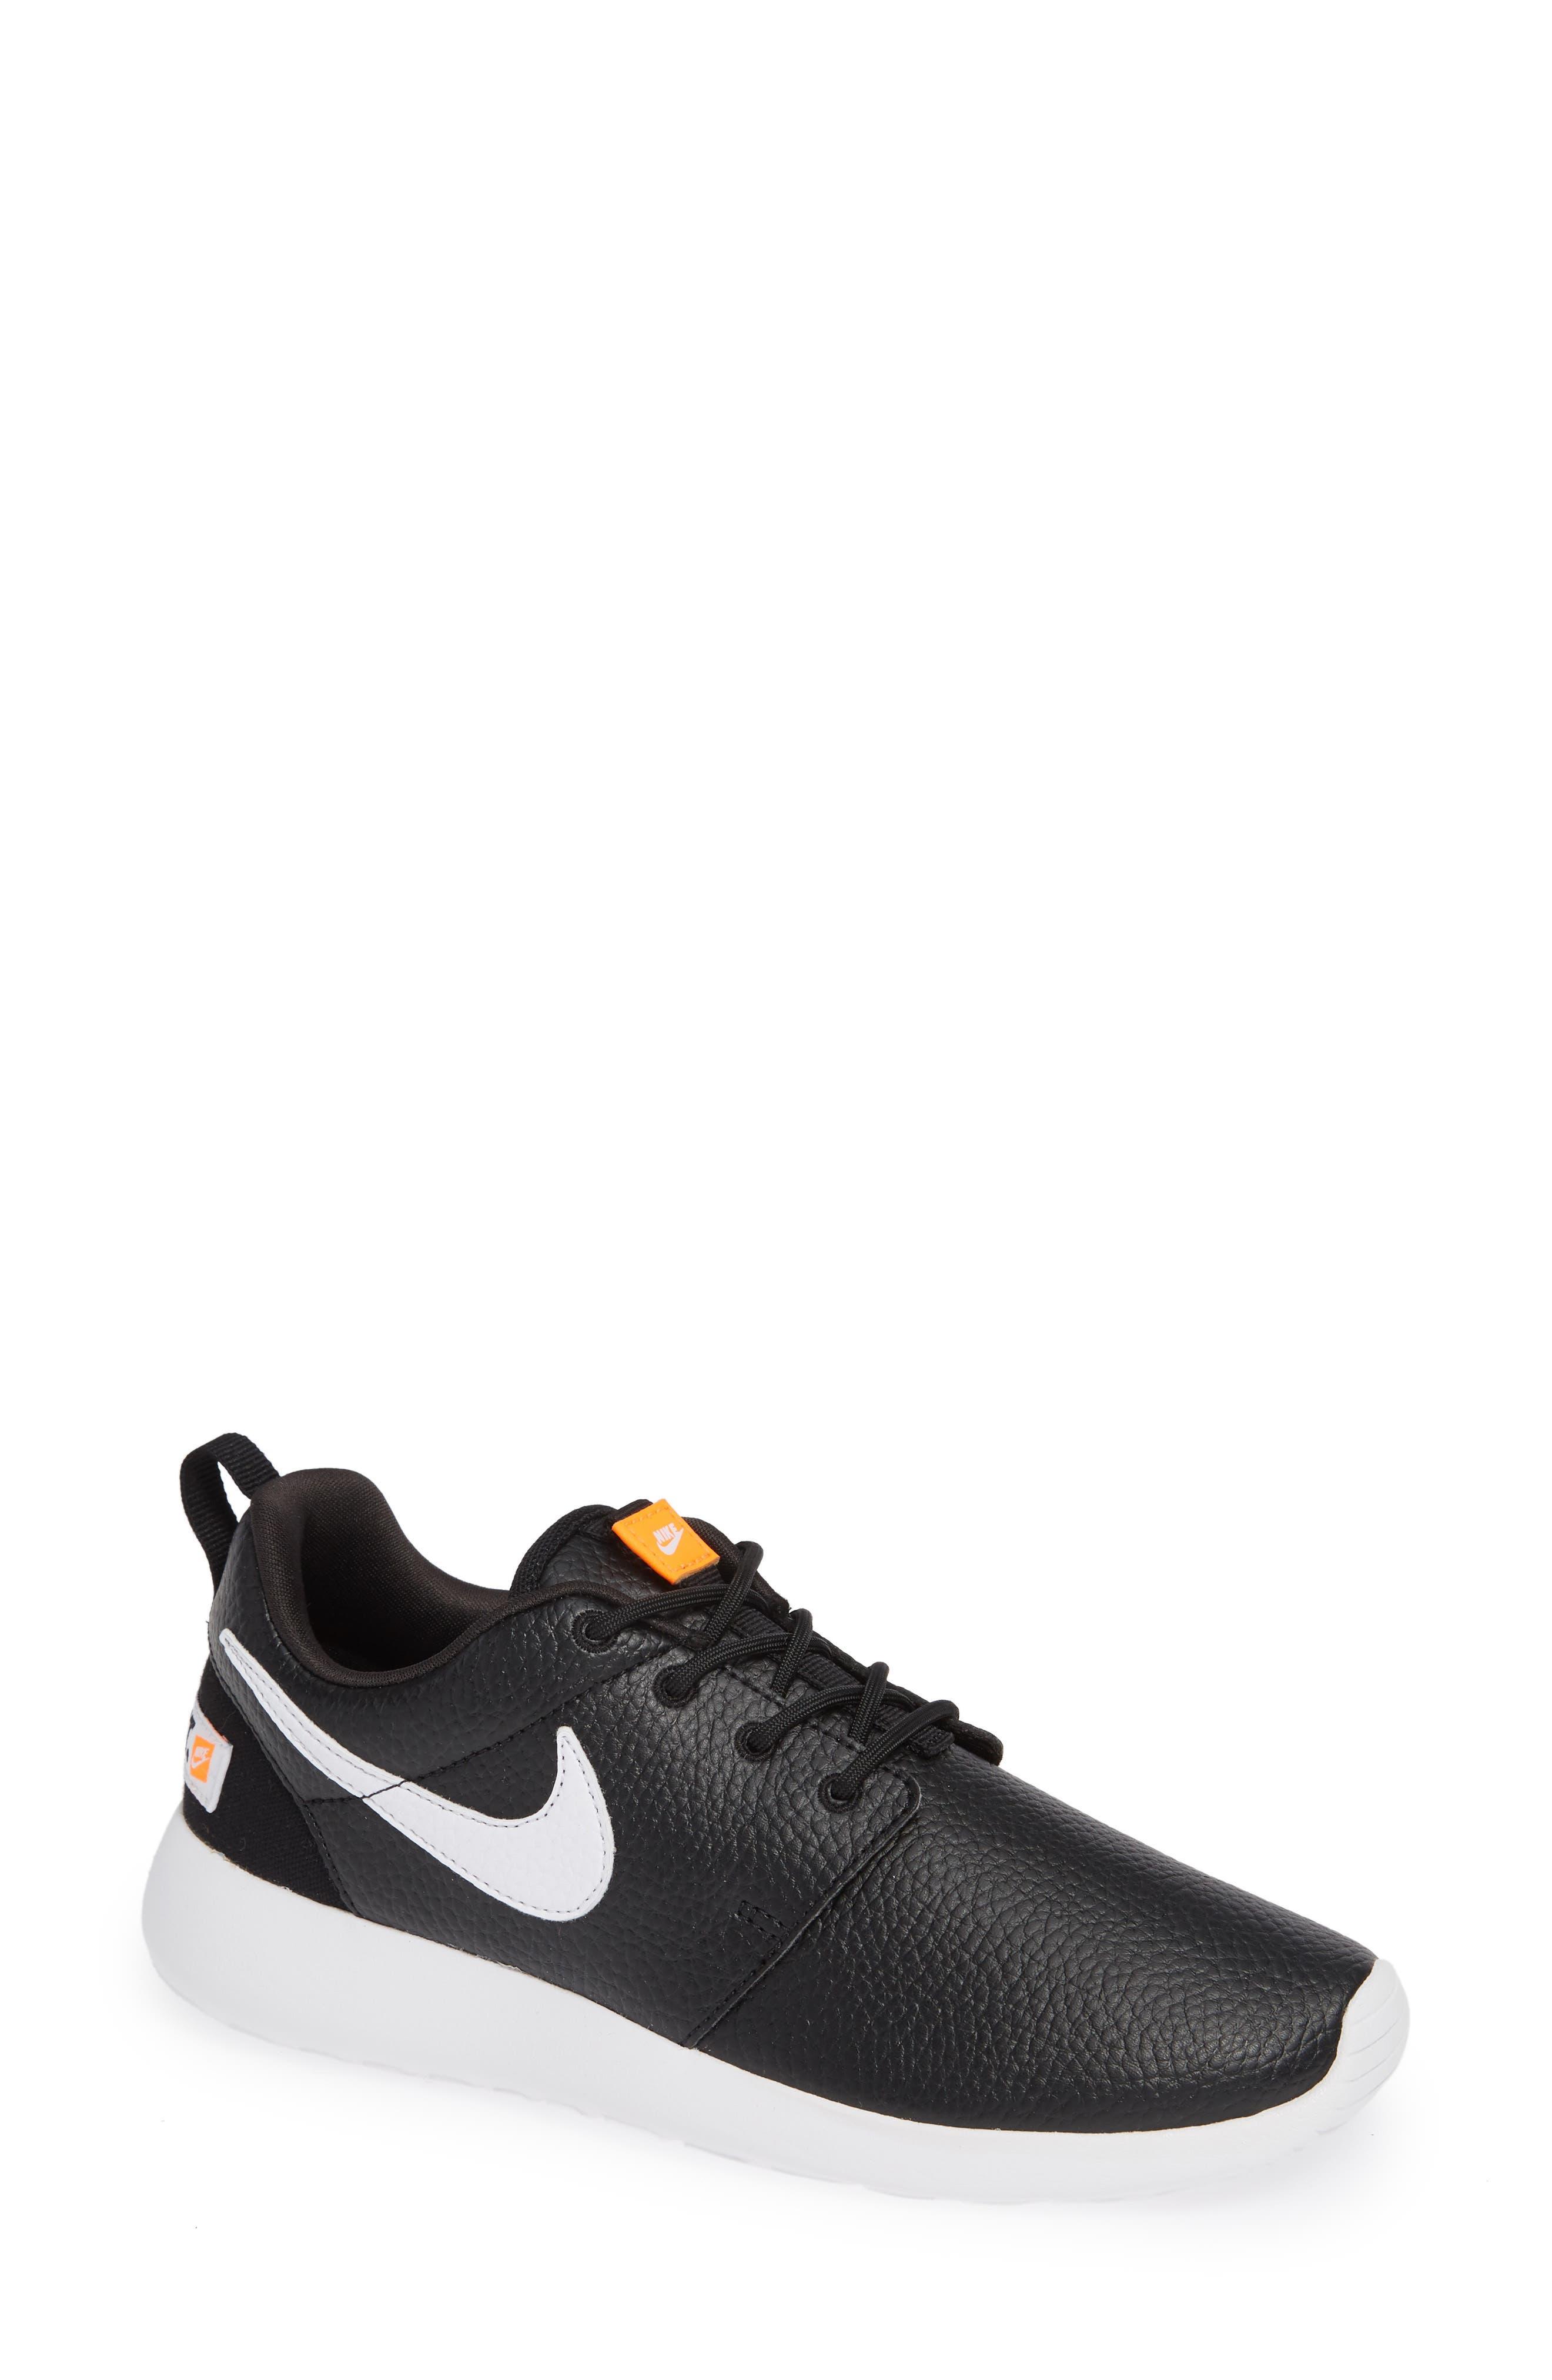 'Roshe Run' Print Sneaker,                             Main thumbnail 1, color,                             Black/ White/ Total Orange